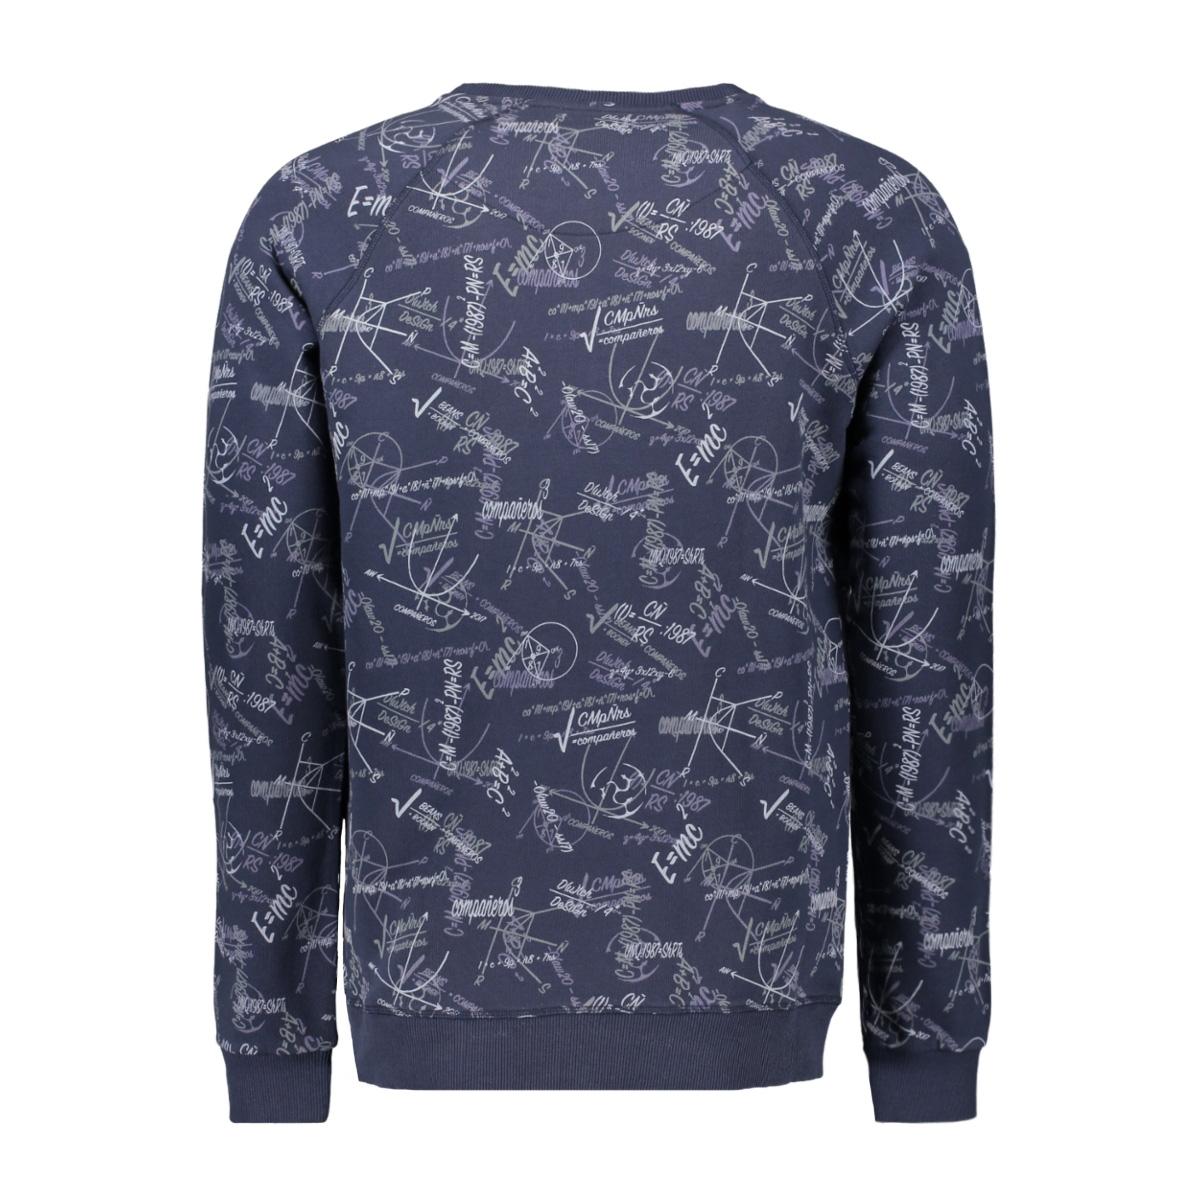 swt002 companeros sweater 02navy